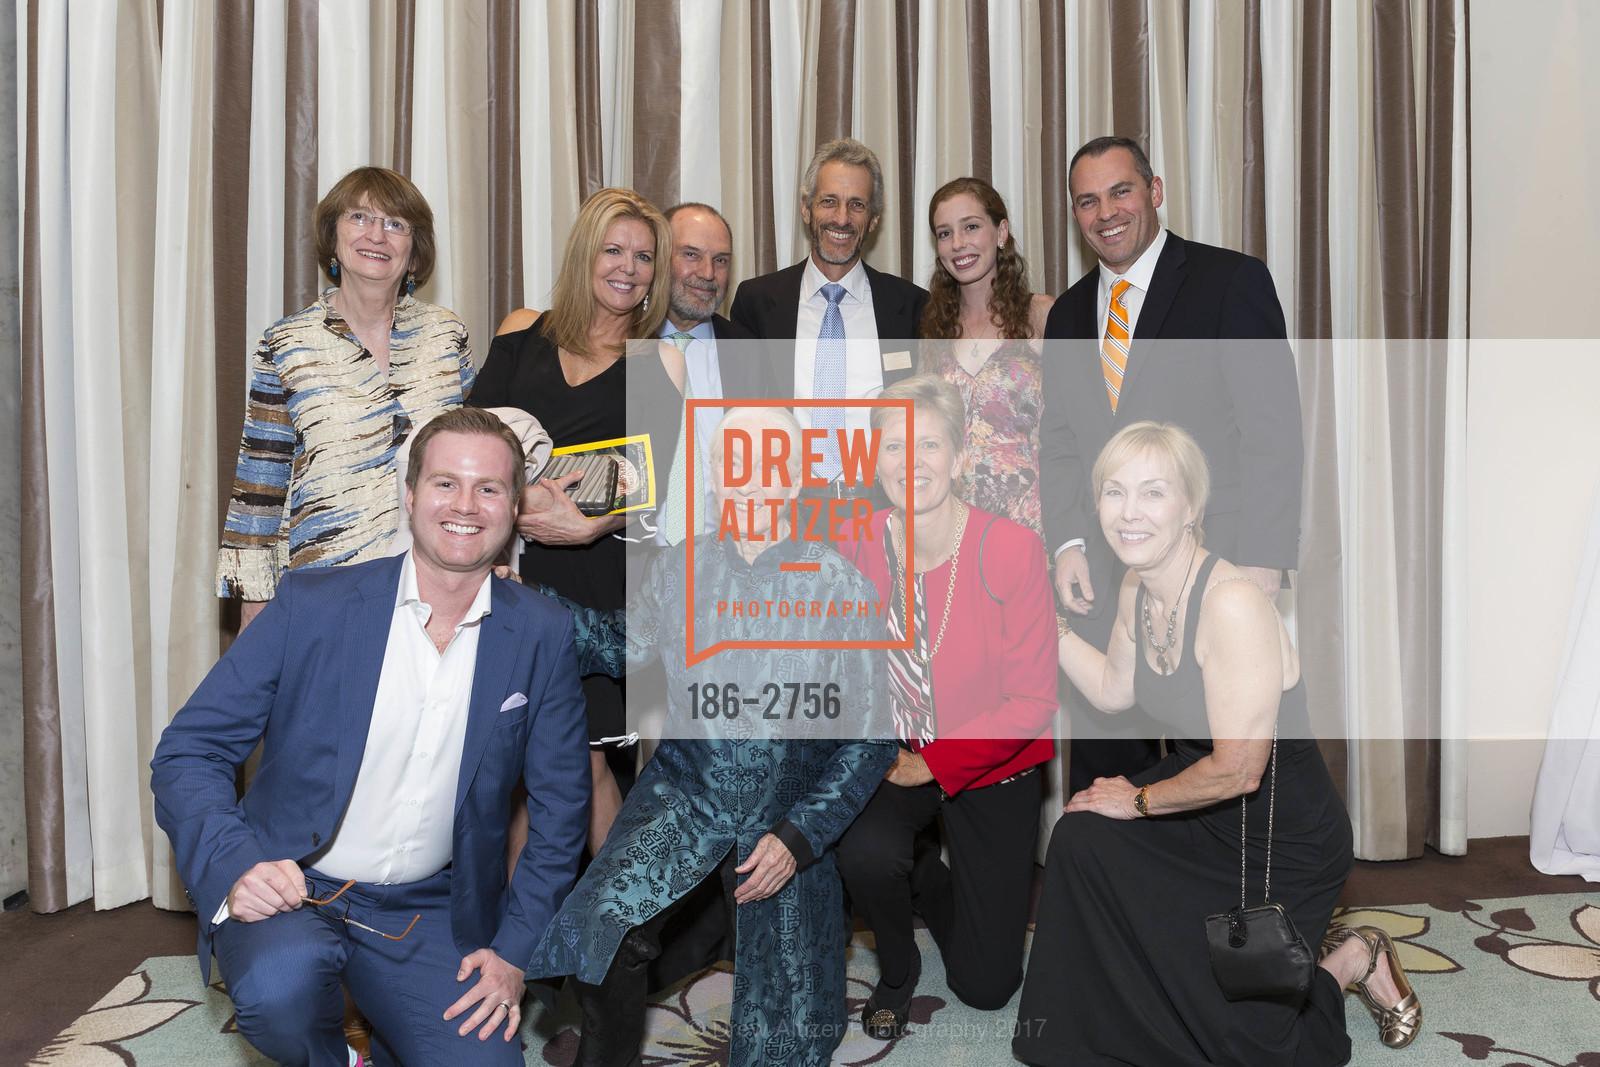 Group Photo, Photo #186-2756